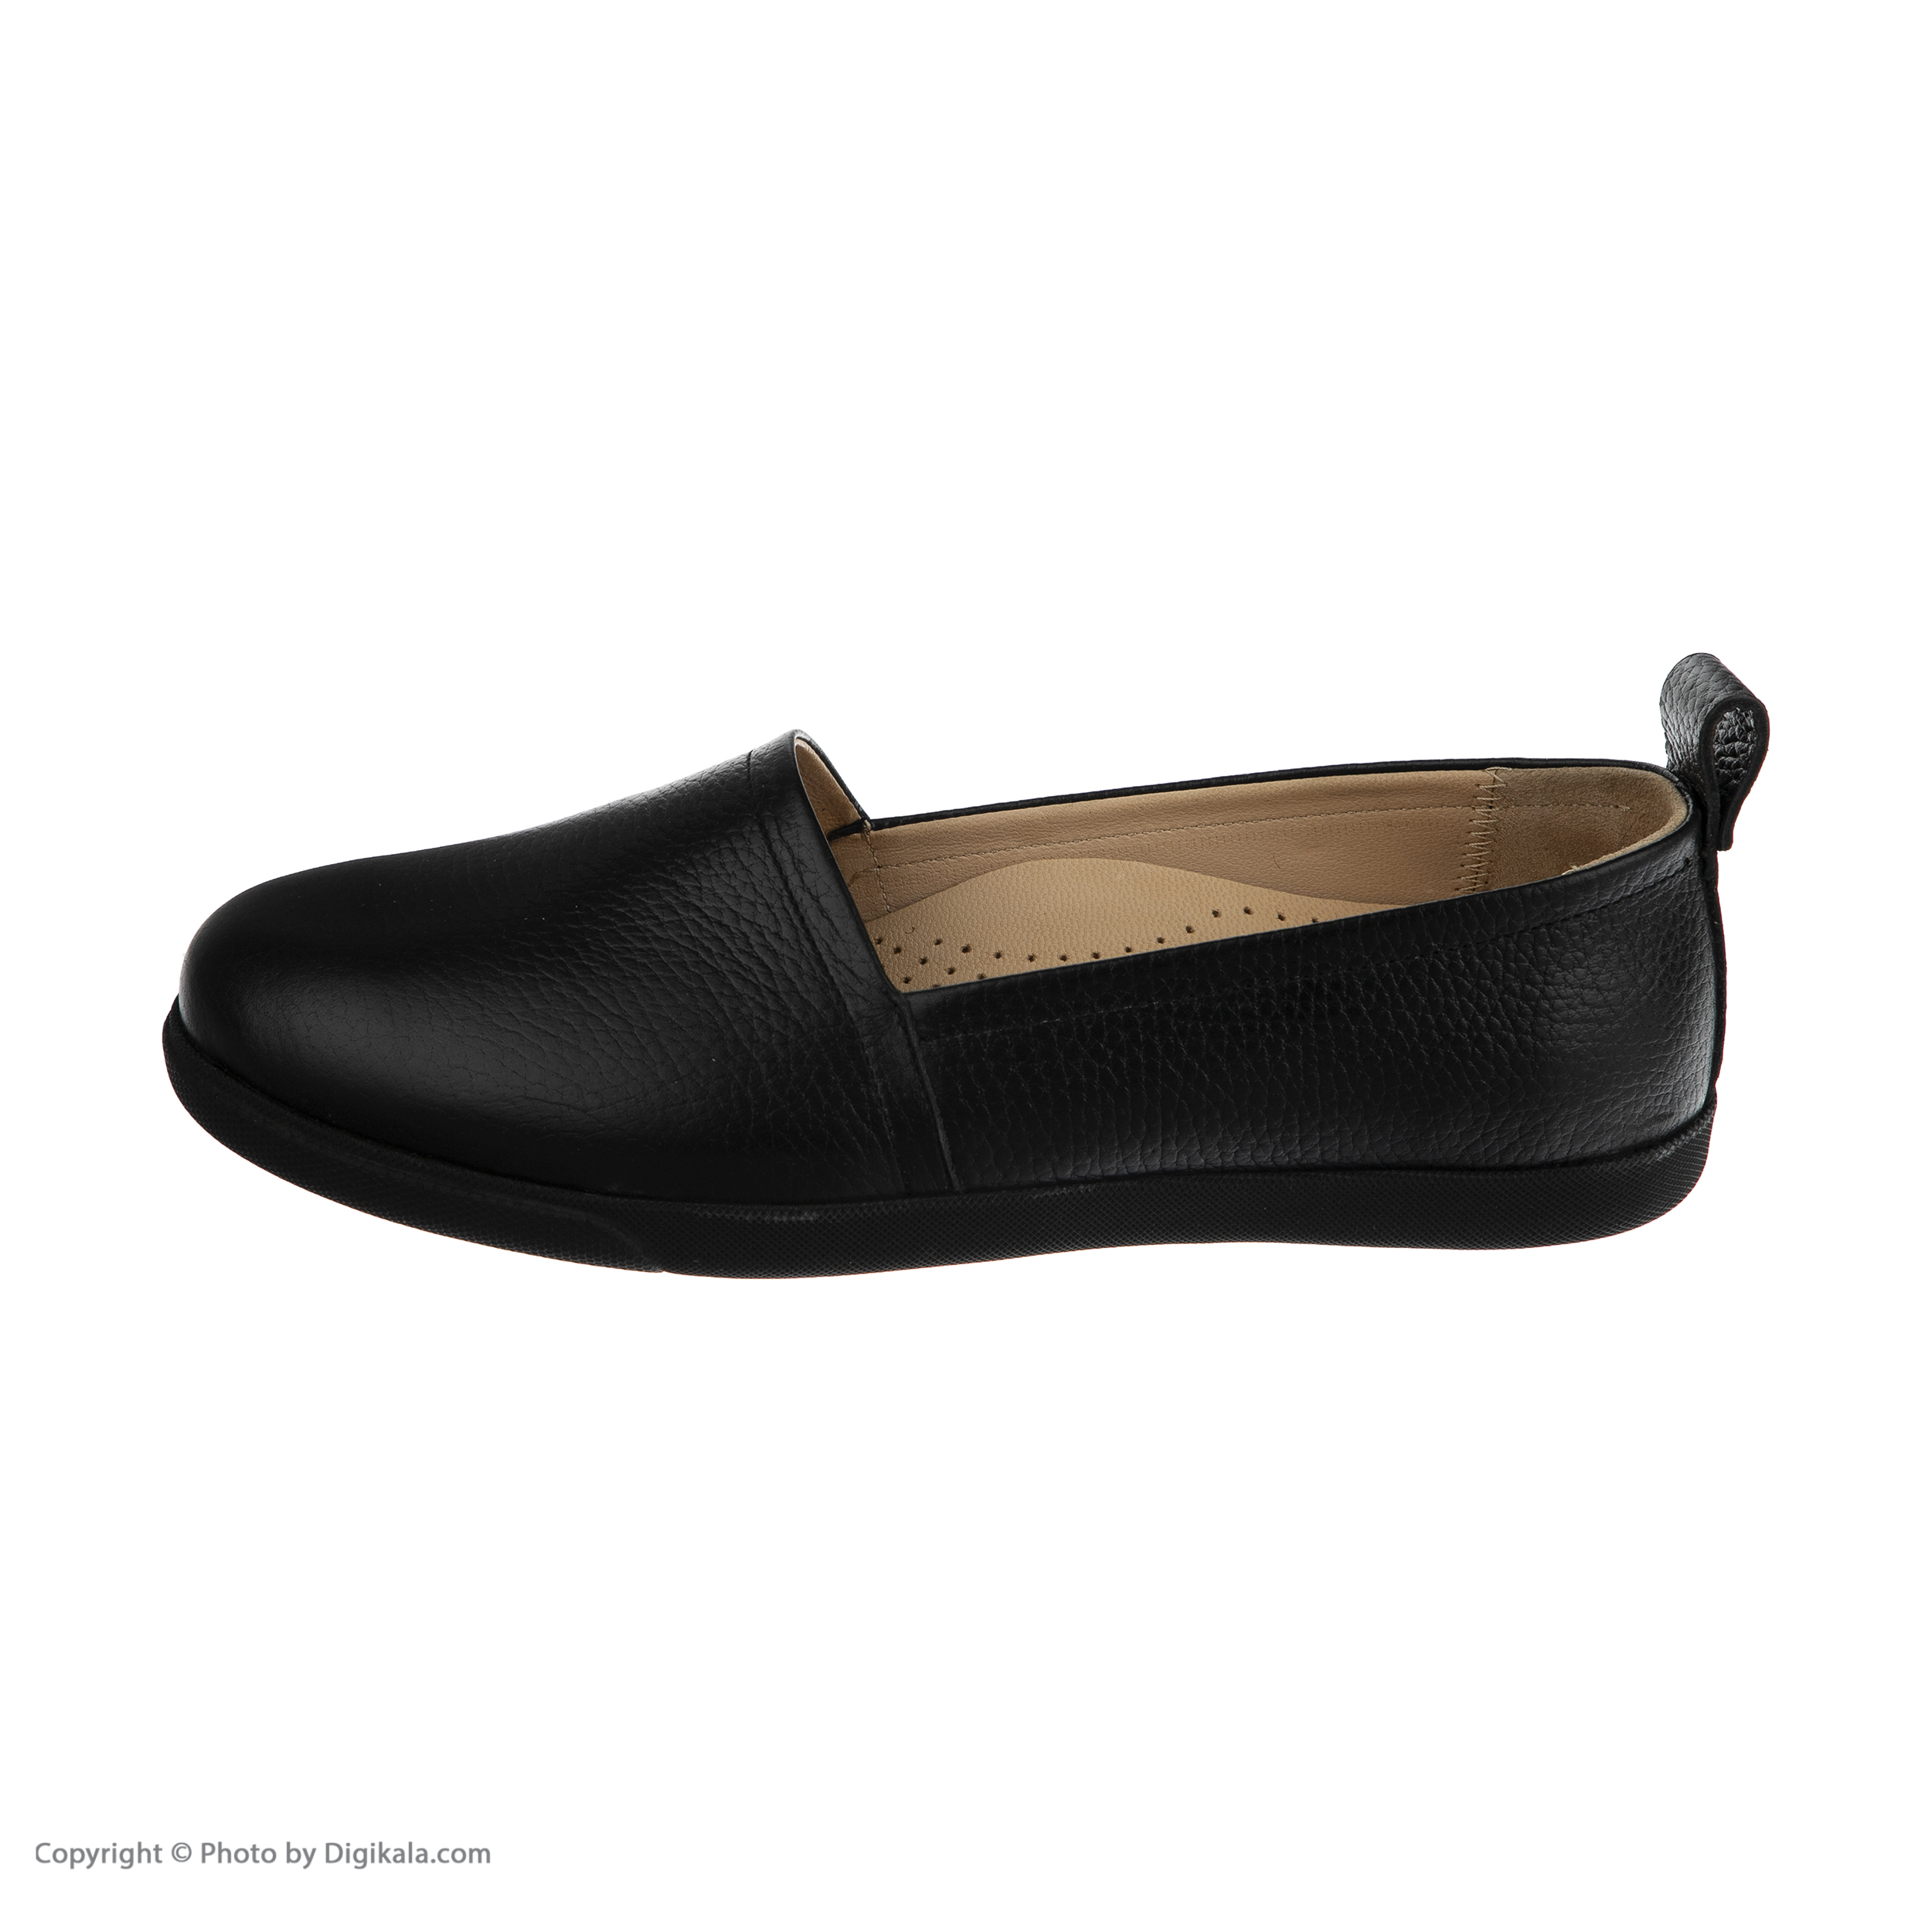 کفش روزمره زنانه برتونیکس مدل 150-B-027